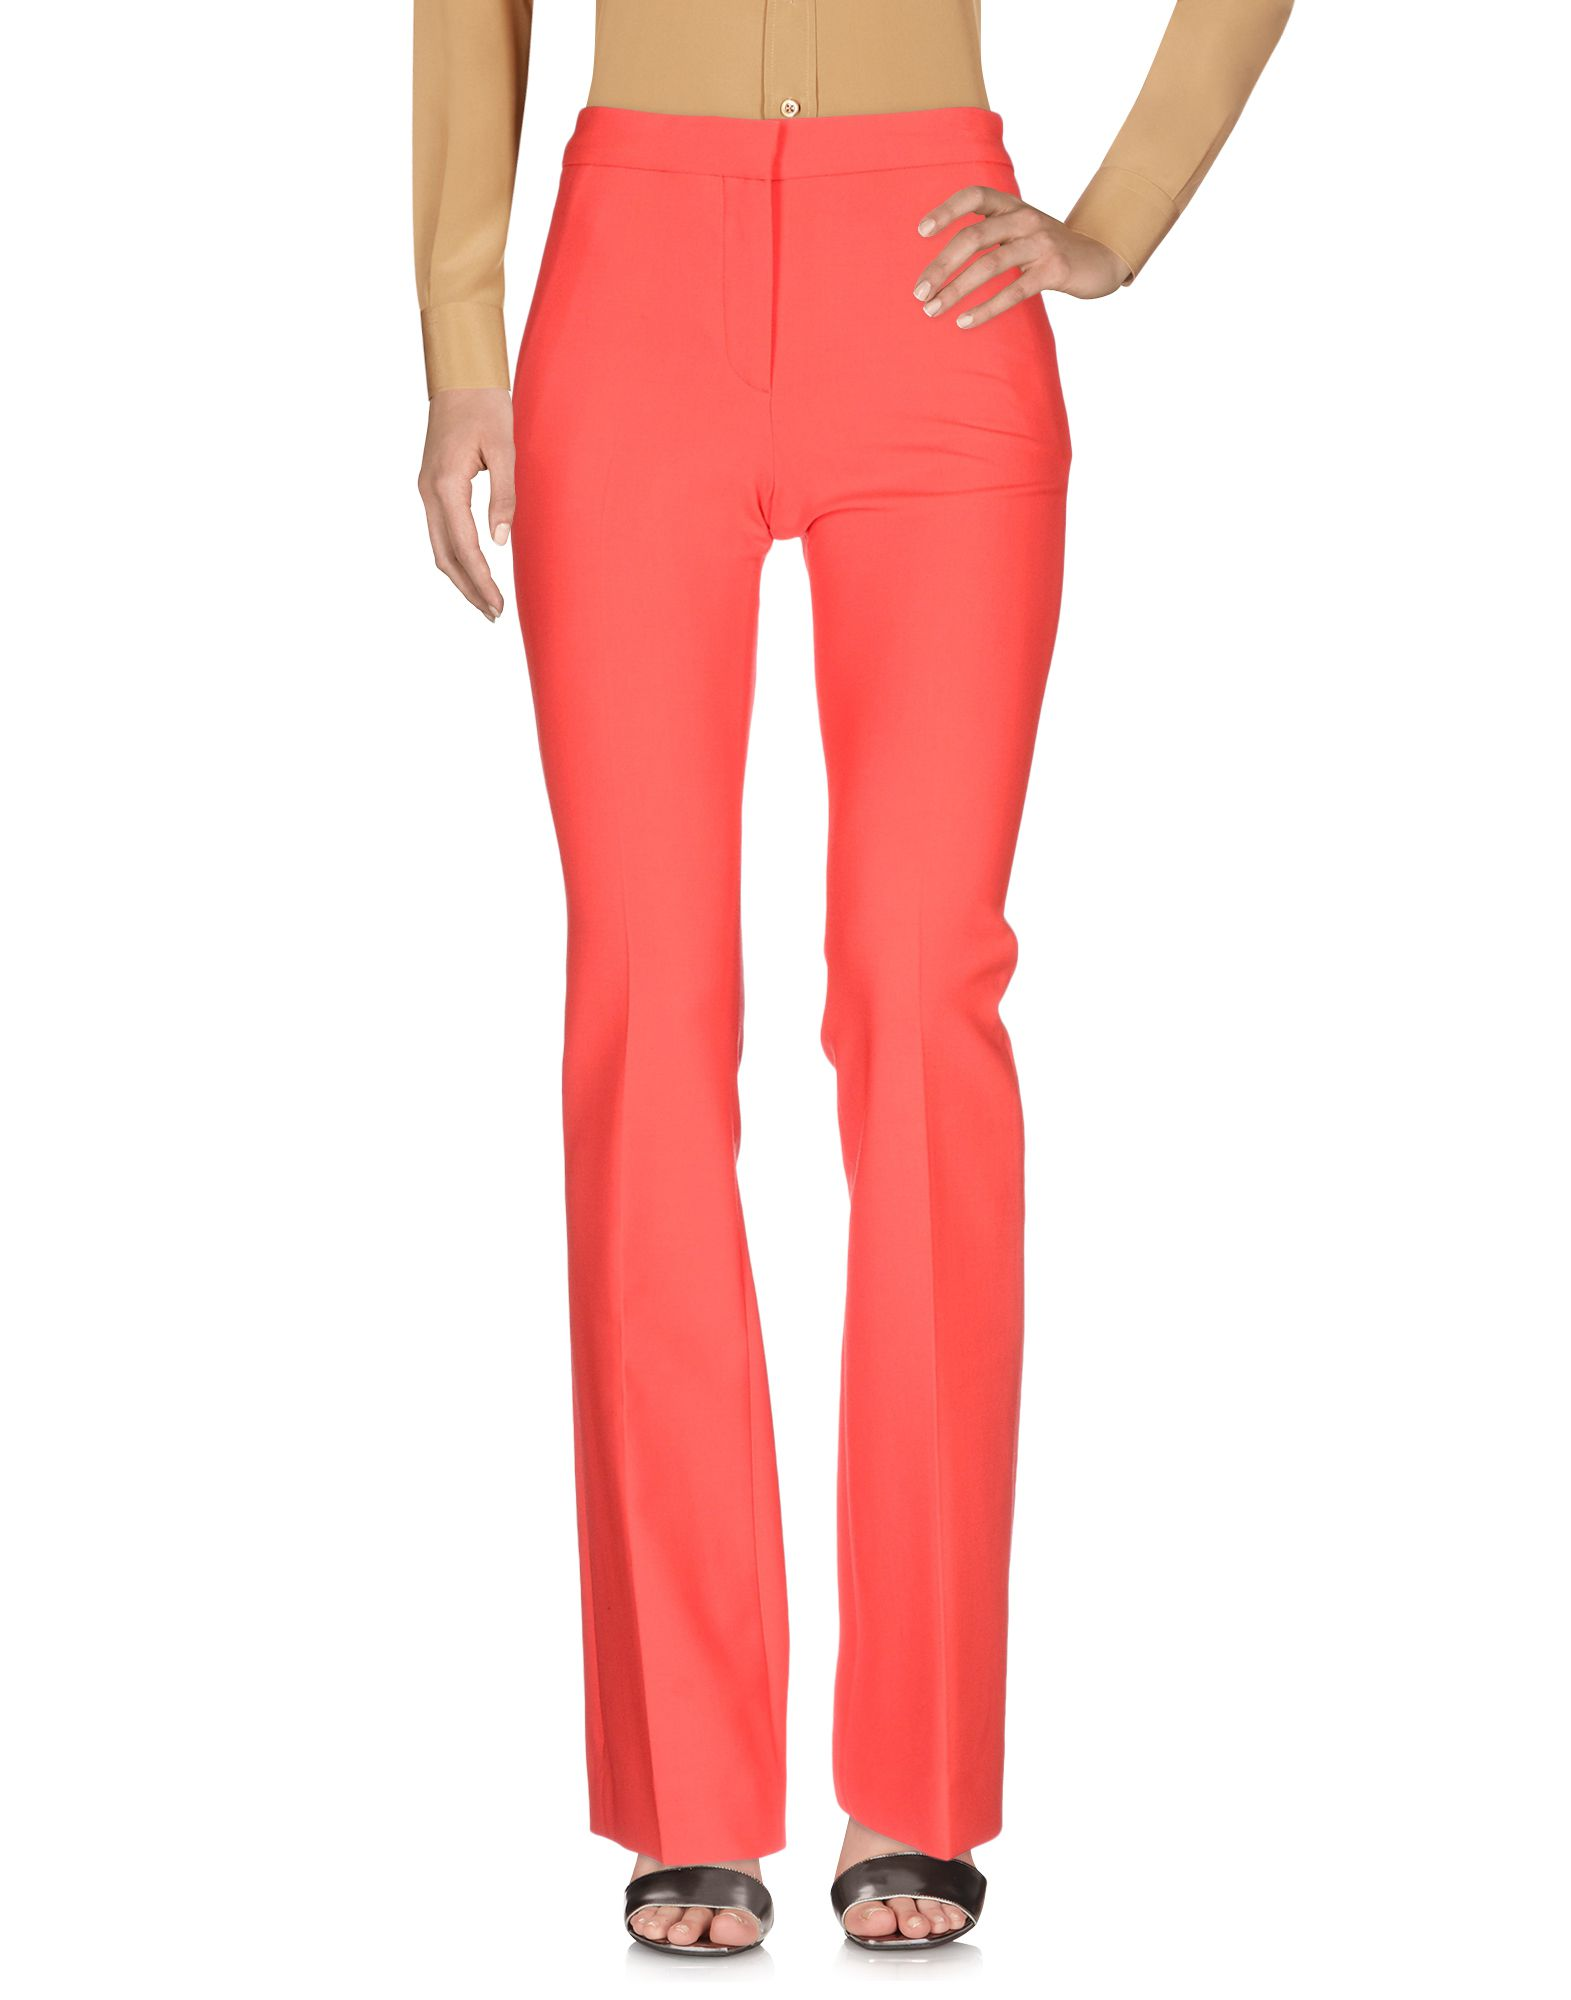 Pantalone Victoria, Victoria Beckham Donna - Acquista online su